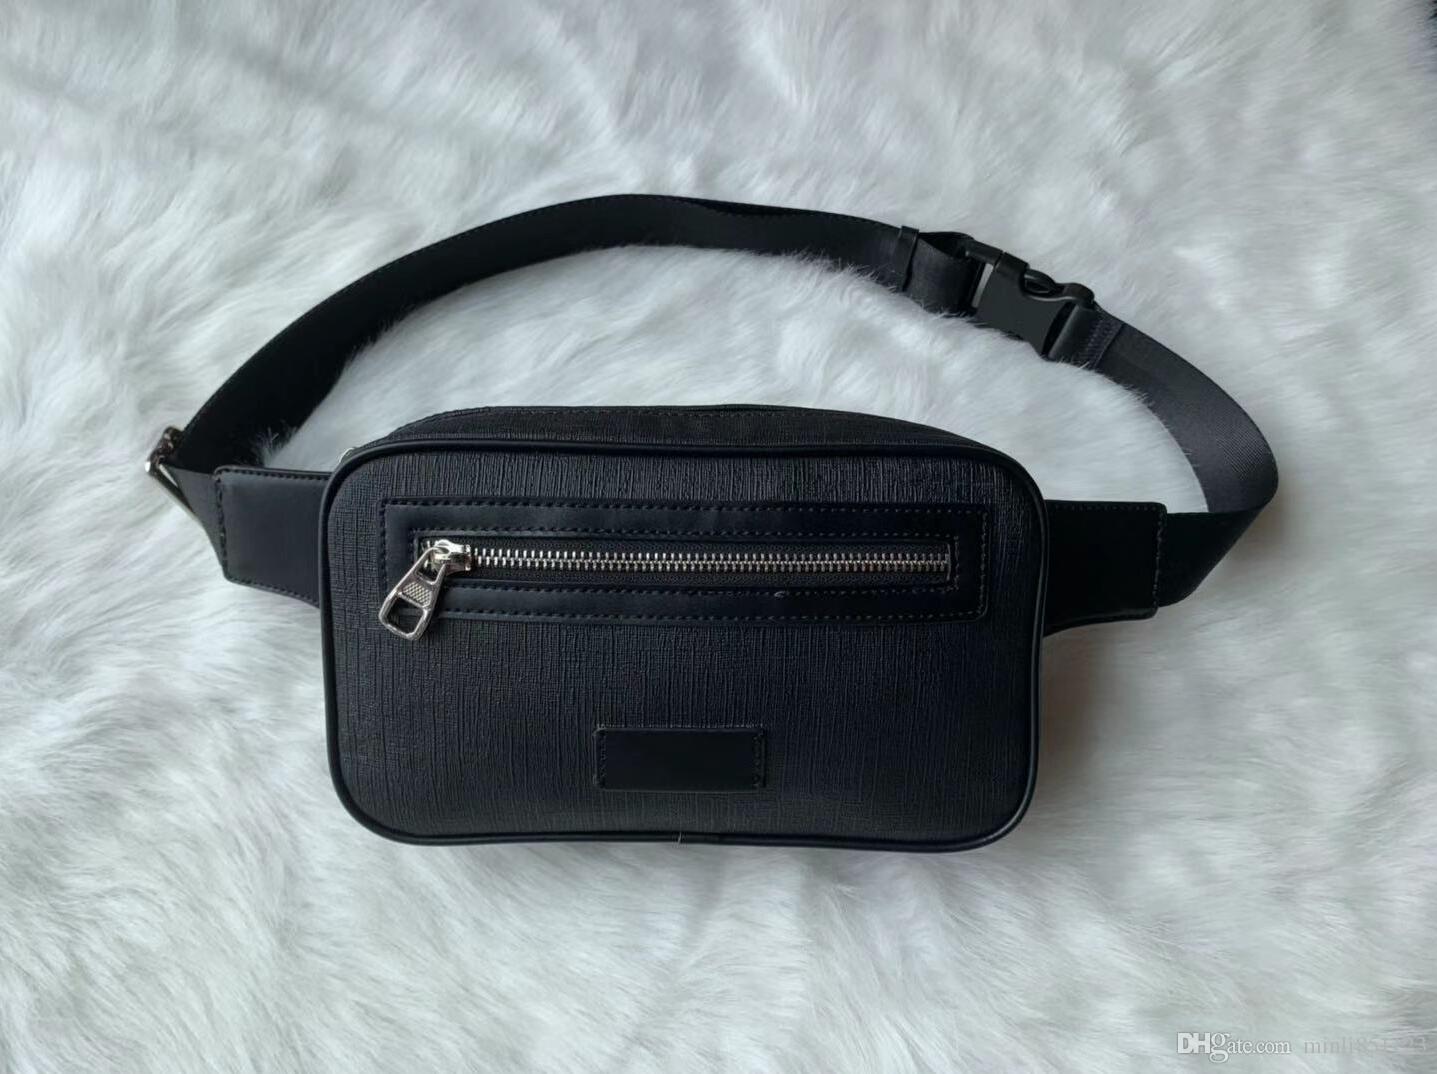 Hot waist bag designer handbags high quality casual chest bags fashion outdoor sports bag free shipping